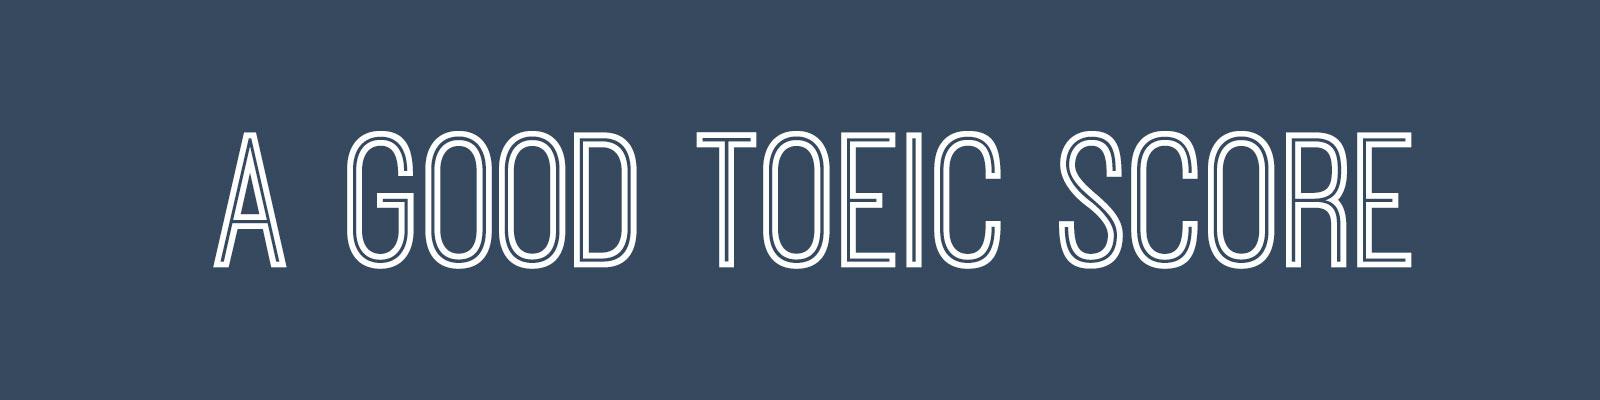 blog-toeic-score